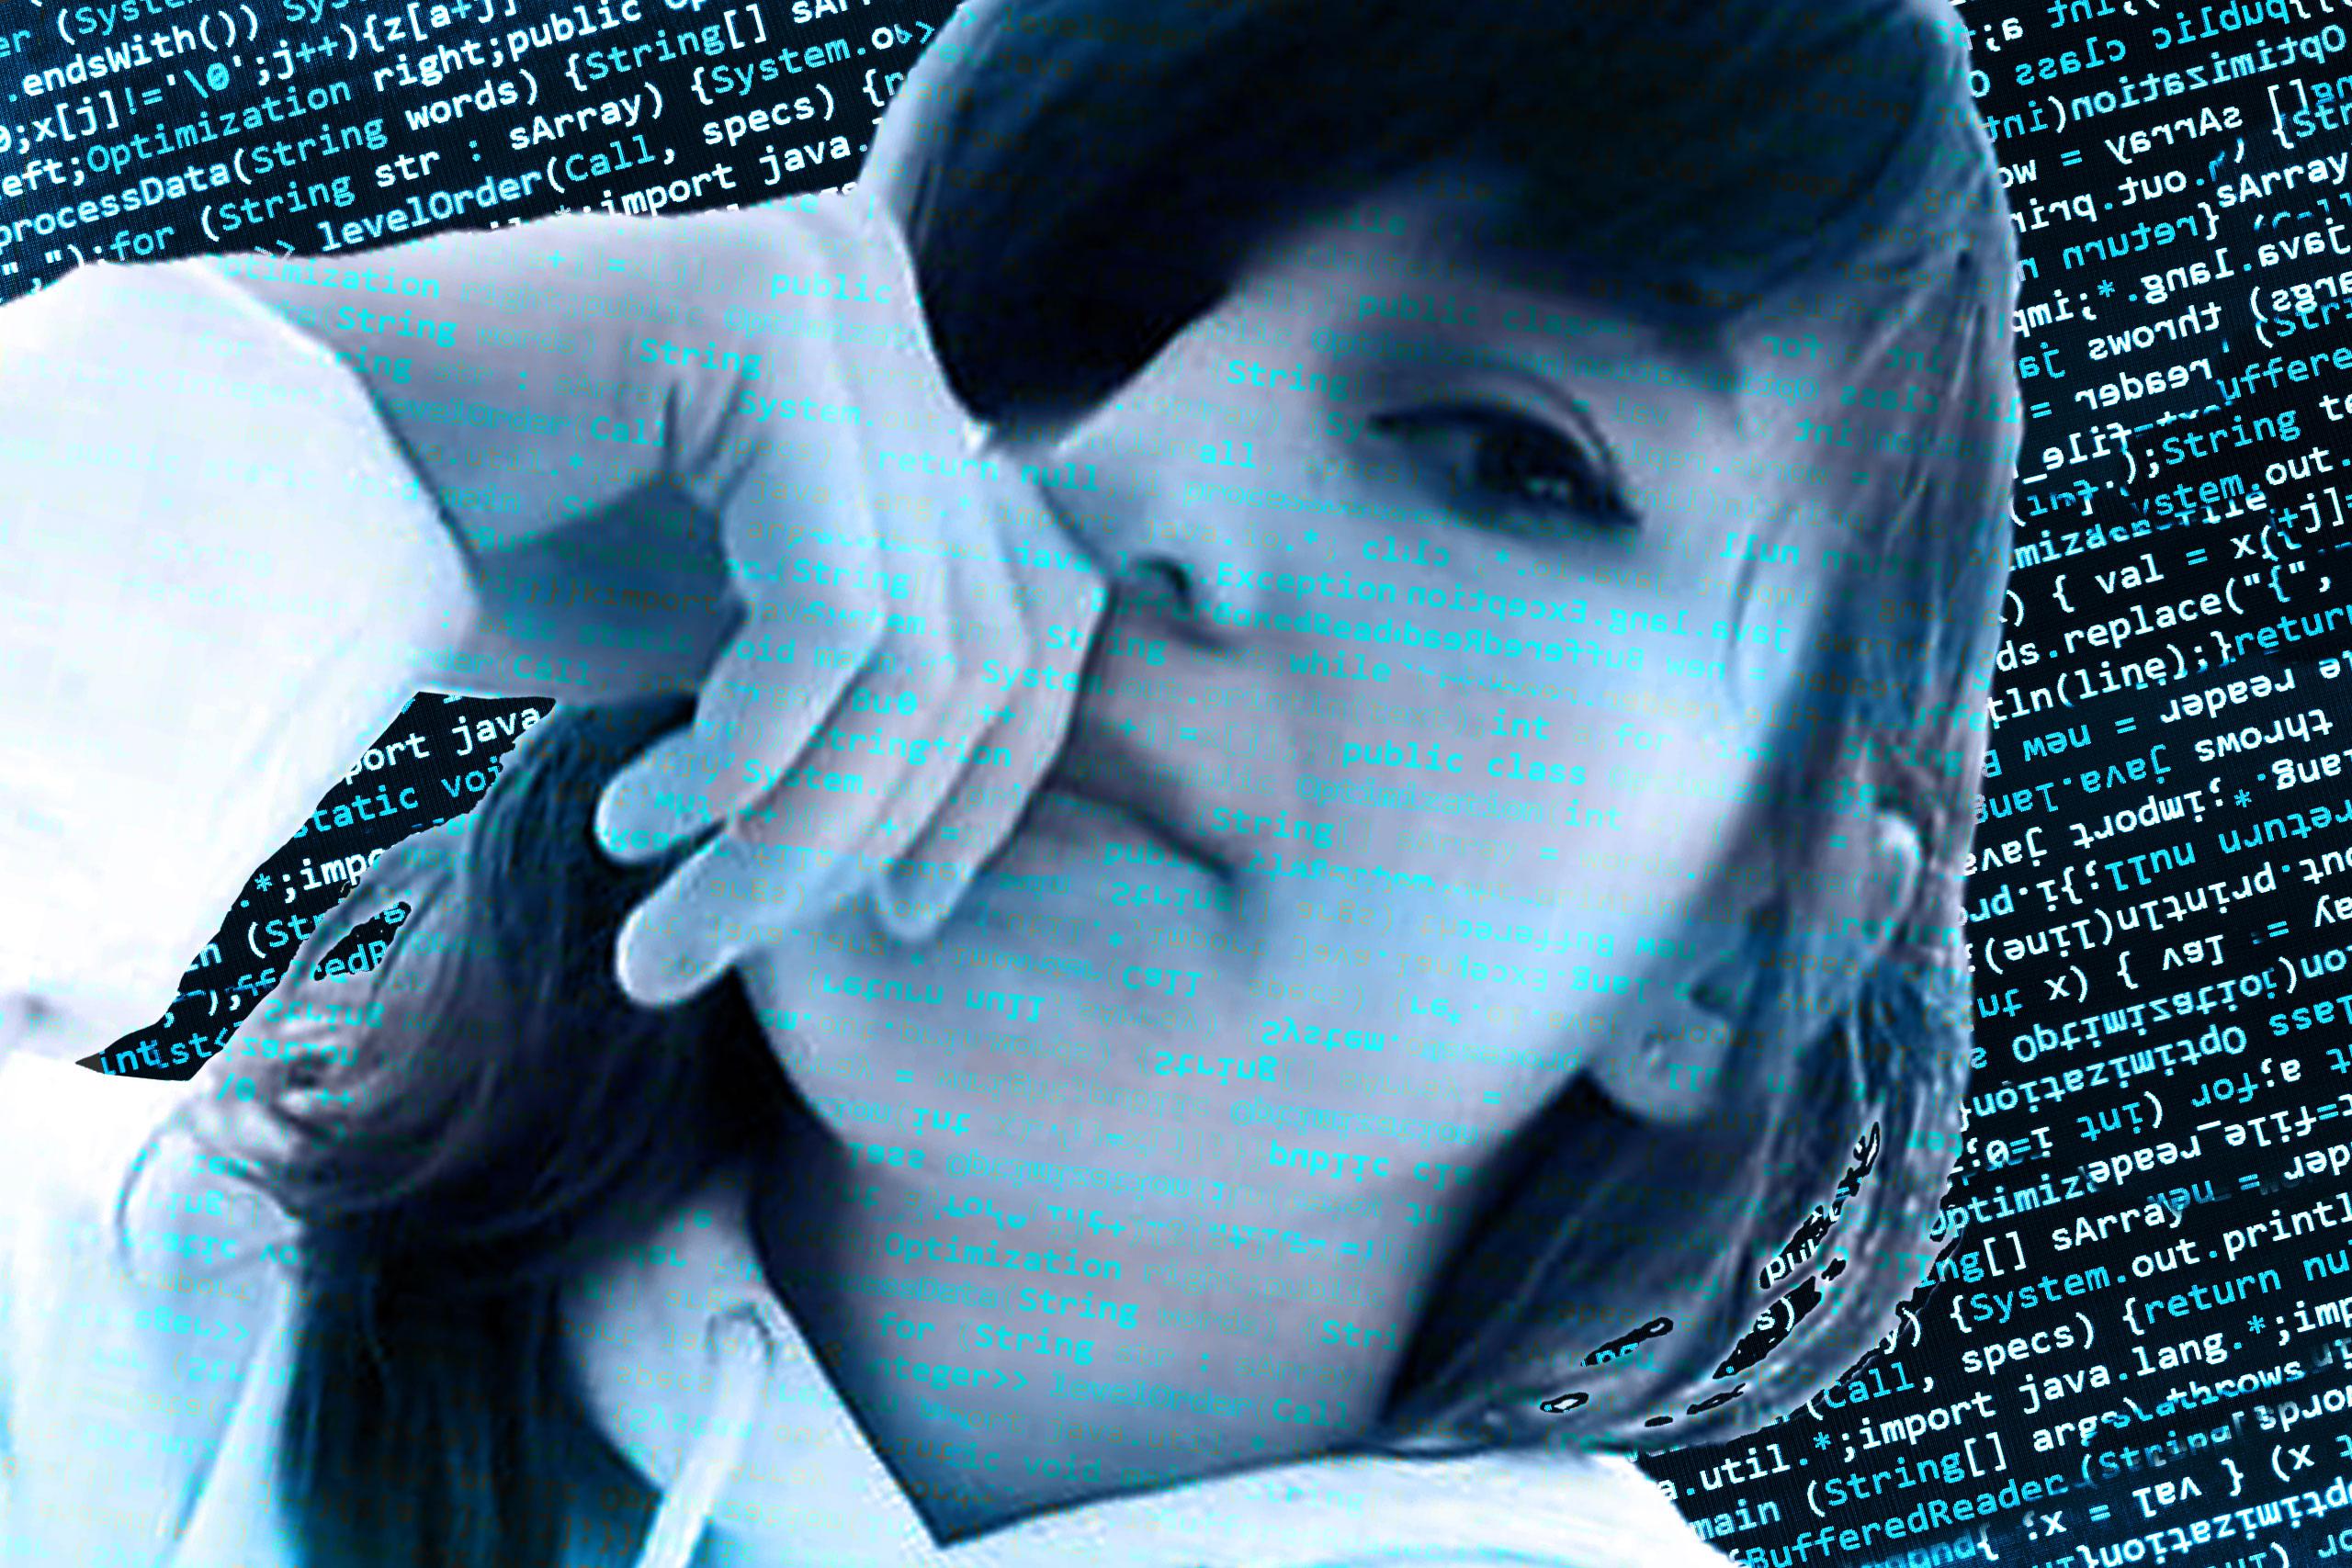 Cybersecurity. La spy story che coinvolge Kaspersky